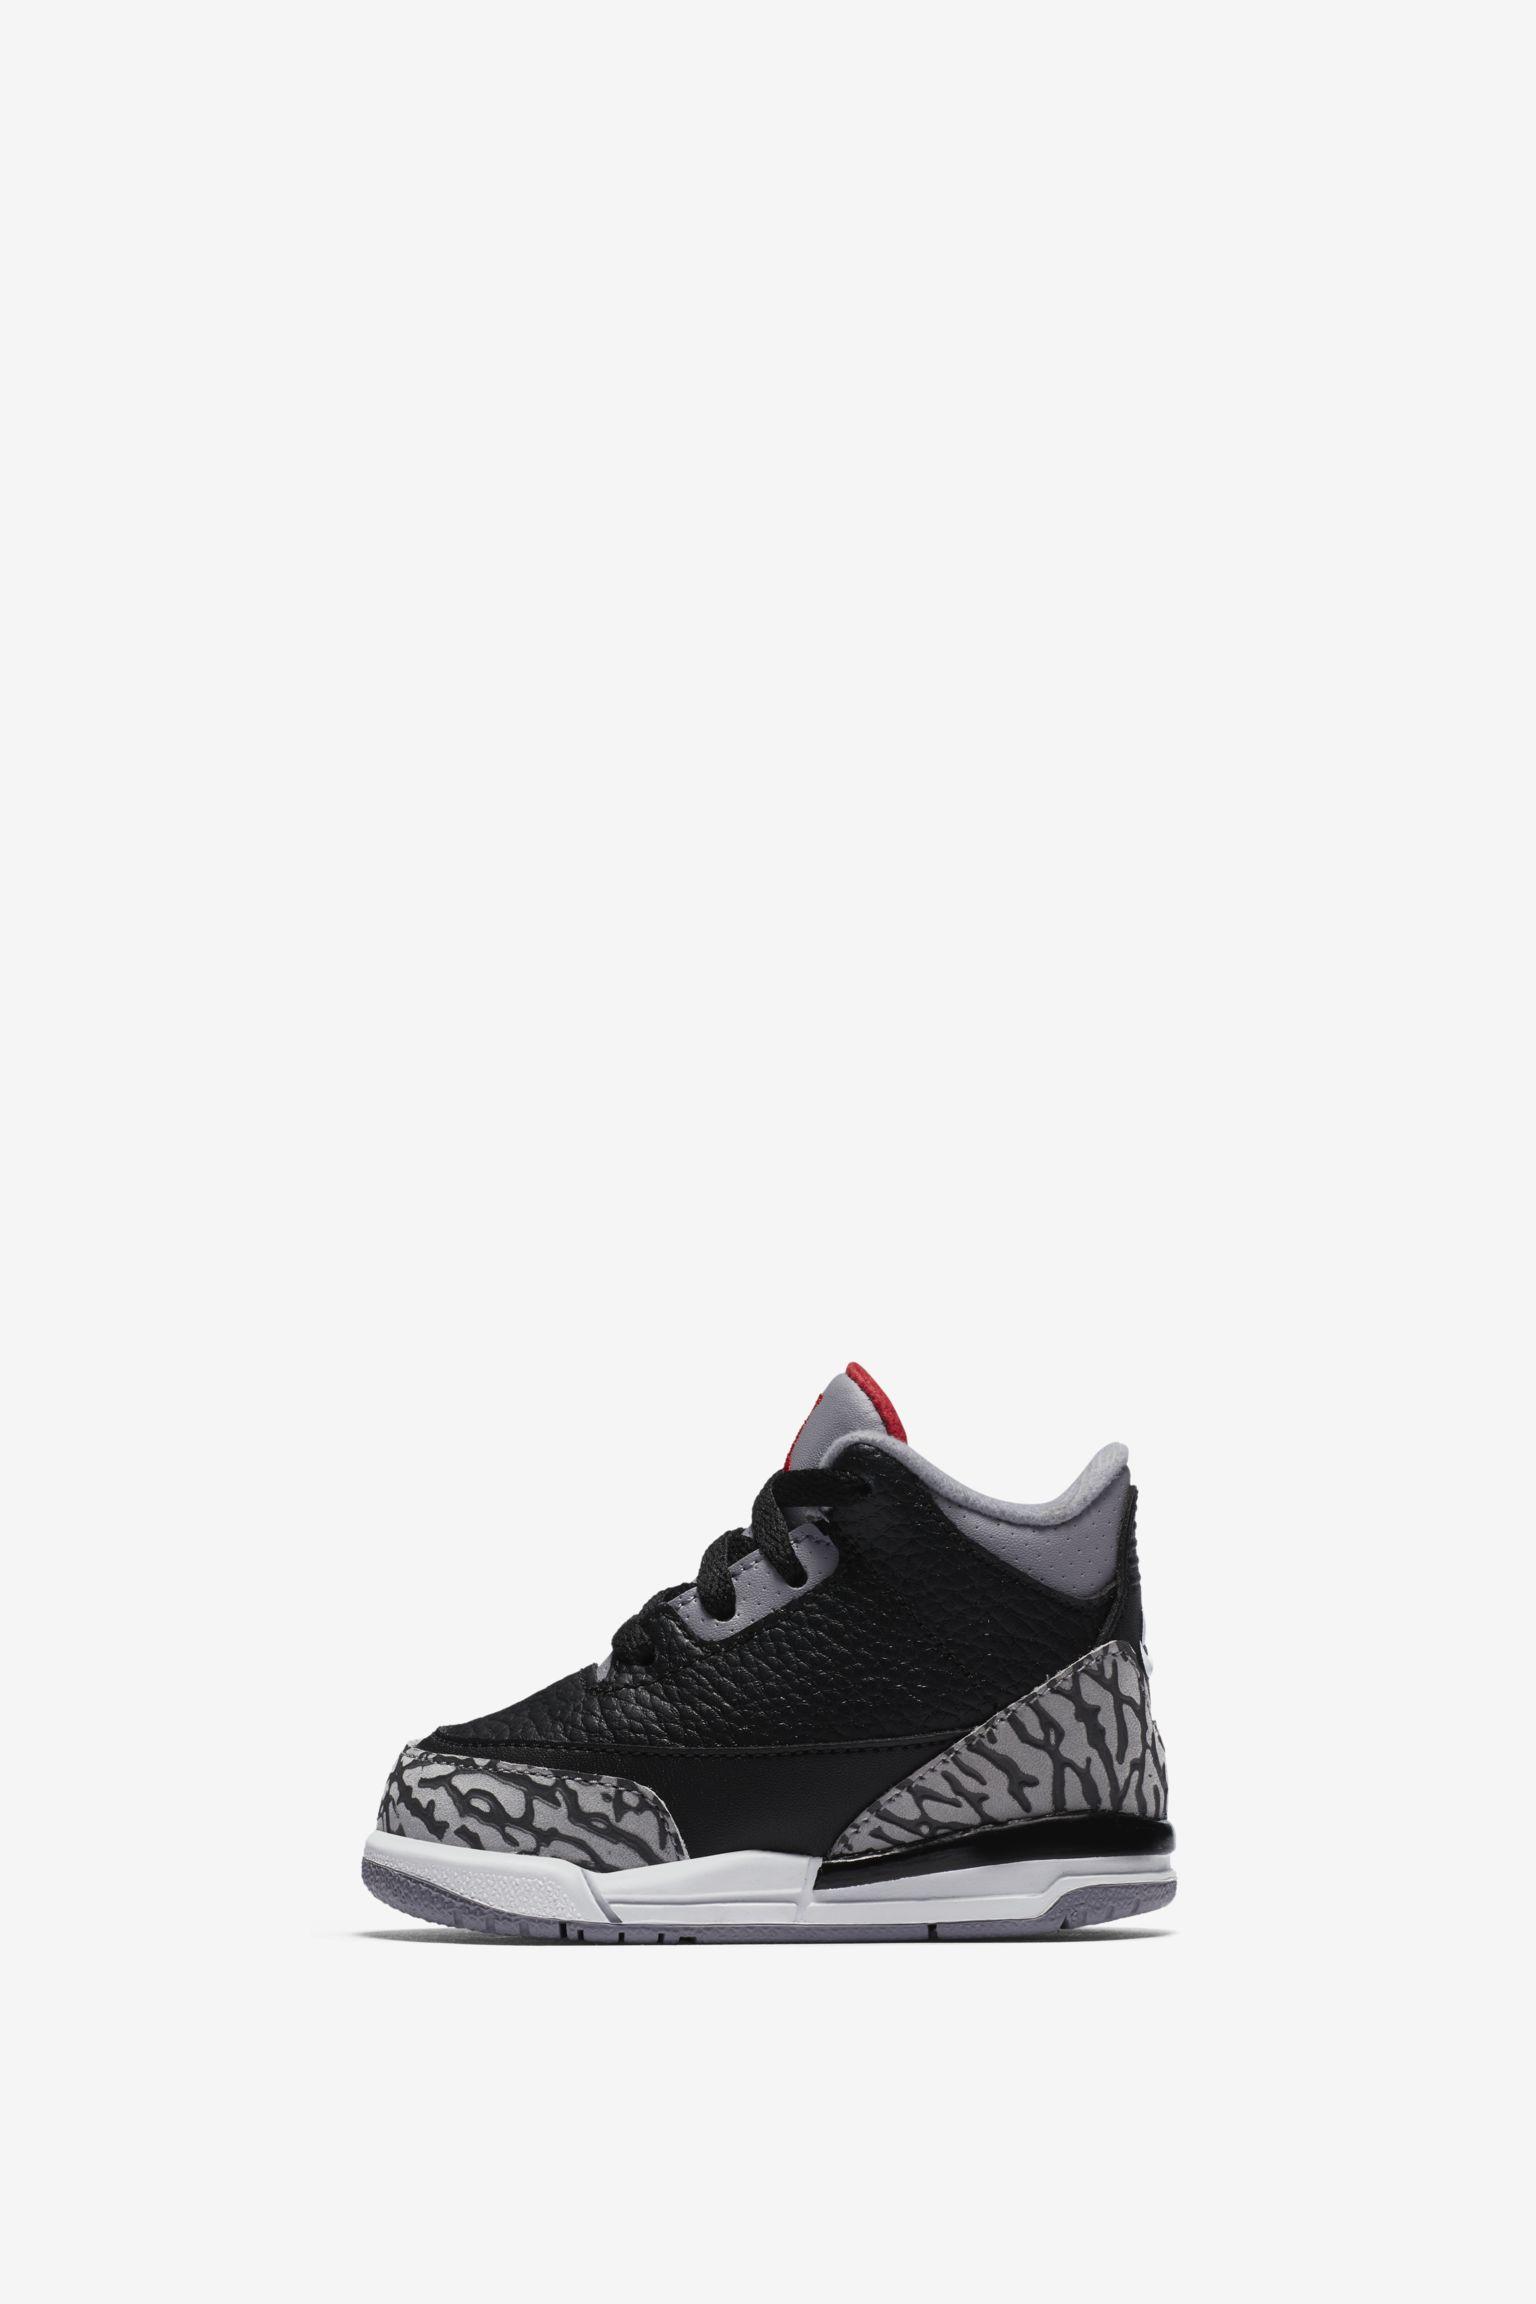 Air Jordan 3 Retro OG 'Black Cement' 2018 Release Date